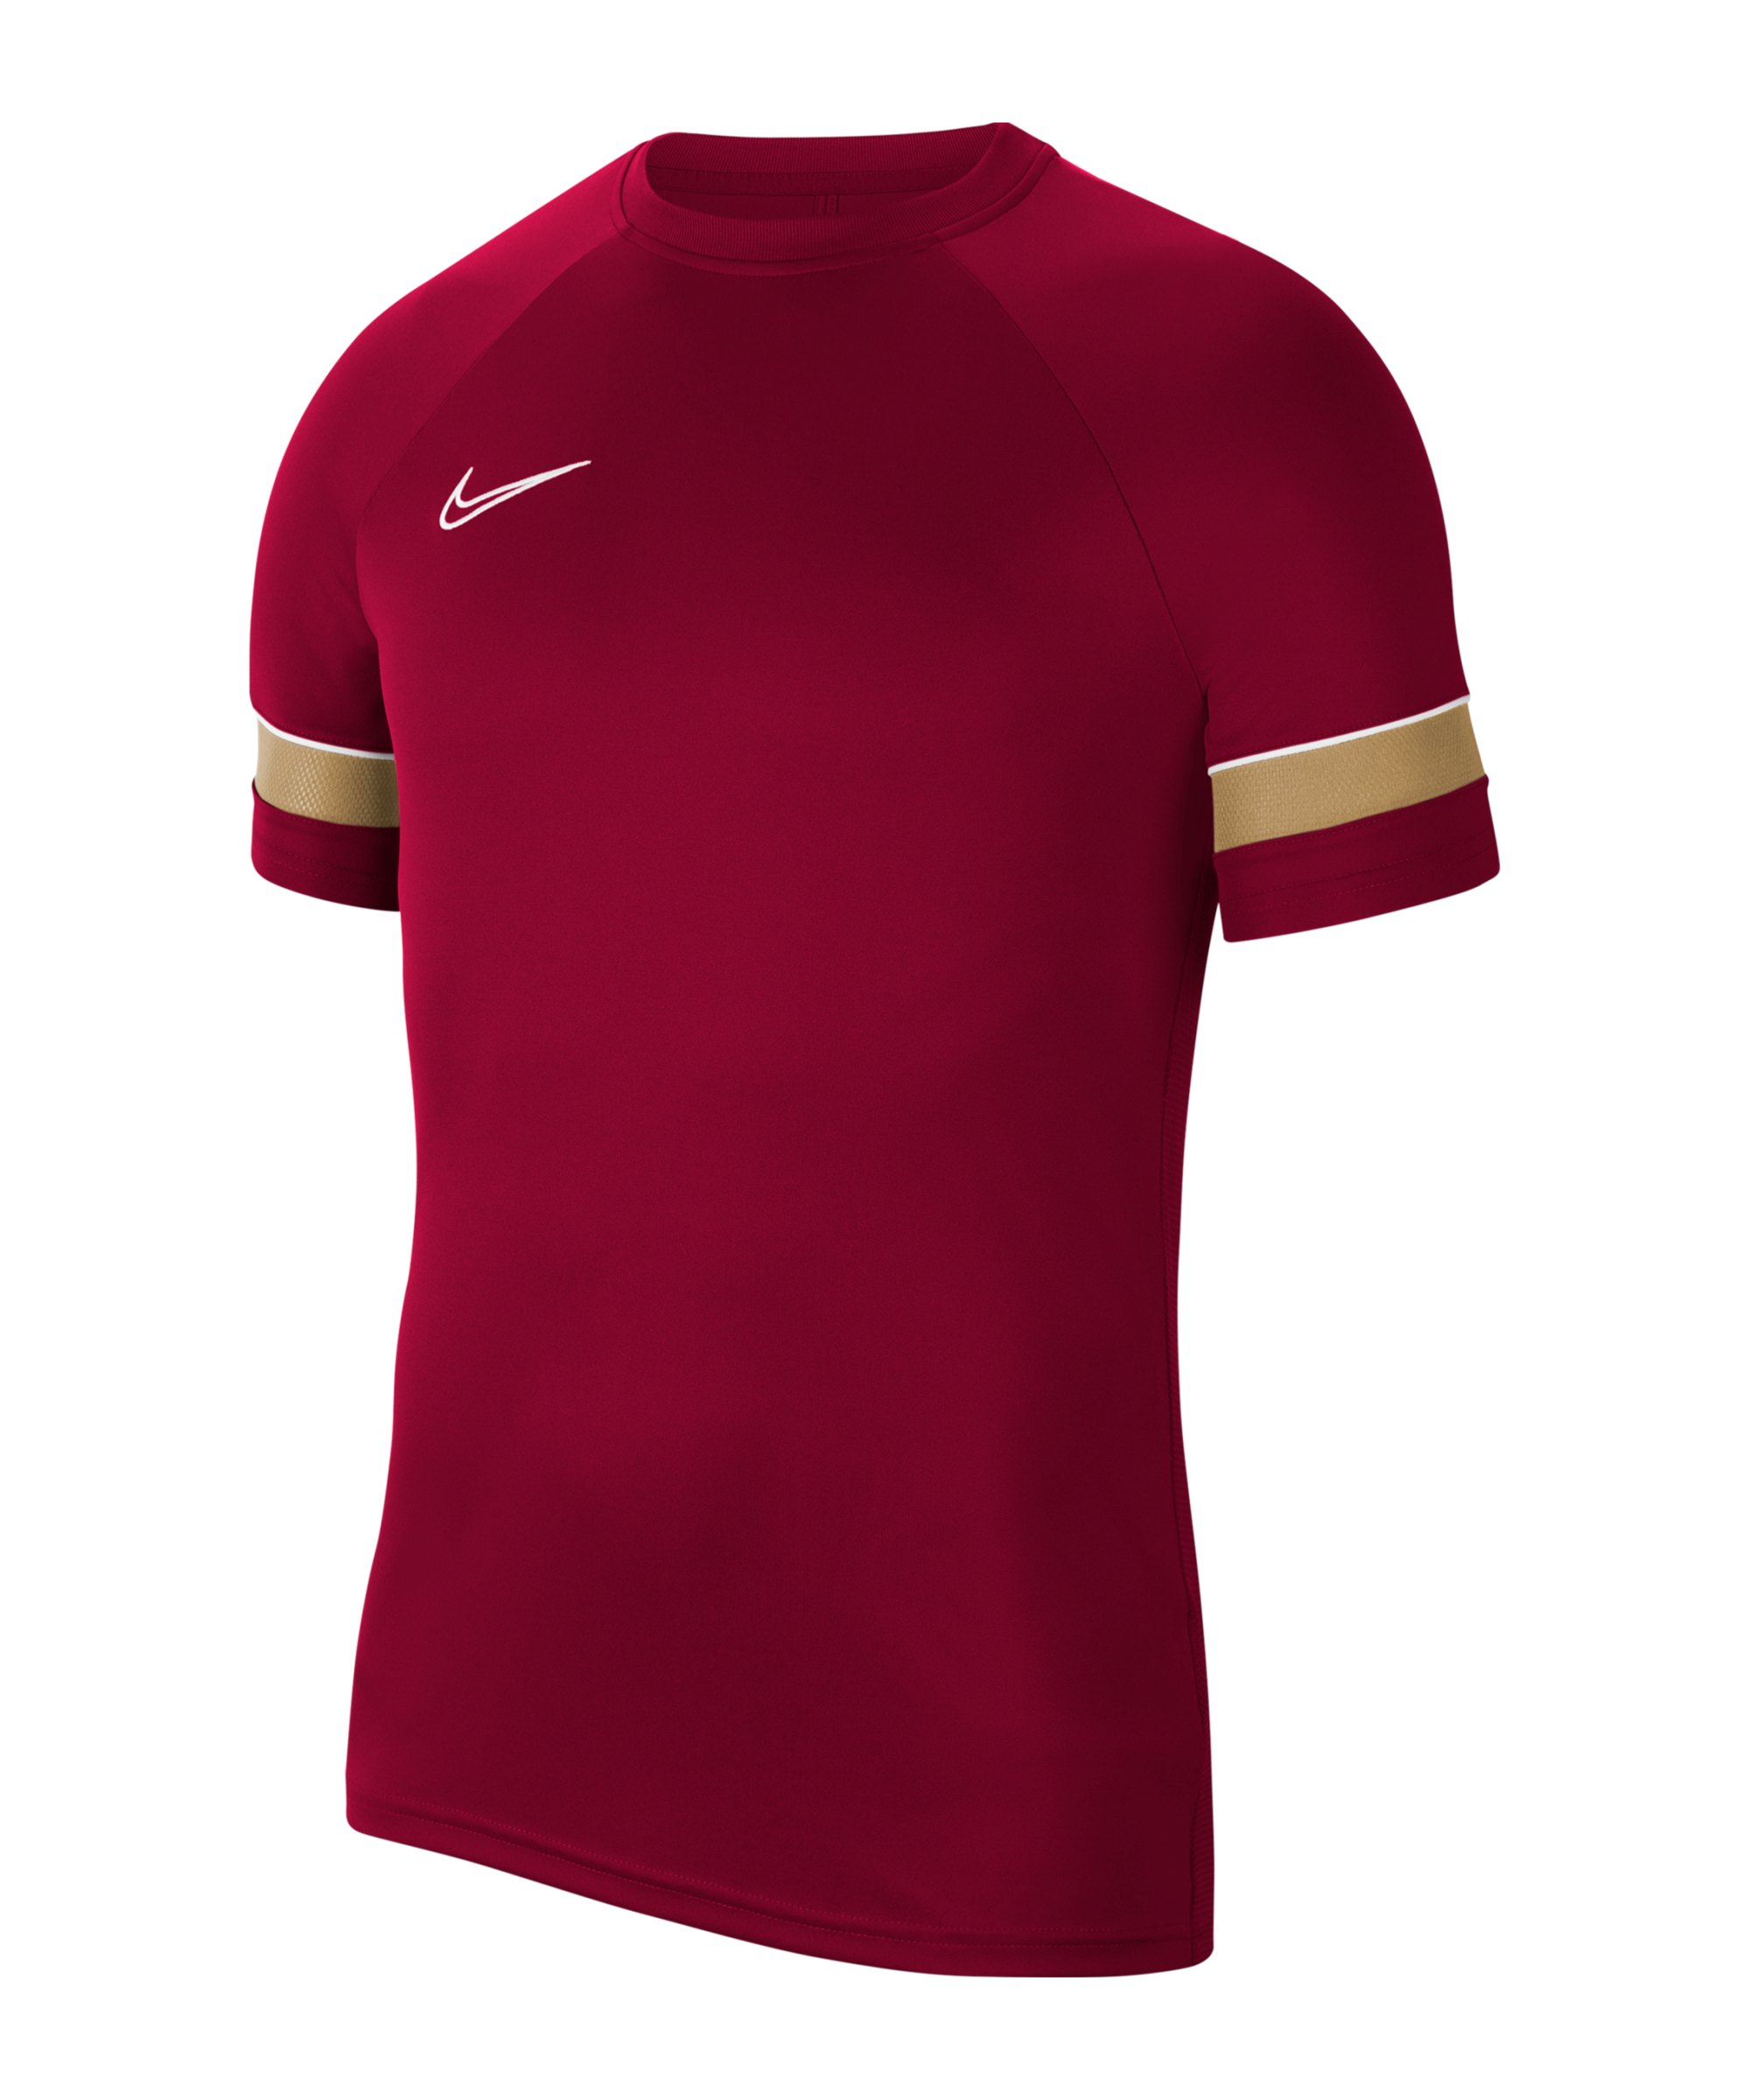 Nike Academy 21 T-Shirt Kids Rot Weiss F677 - rot